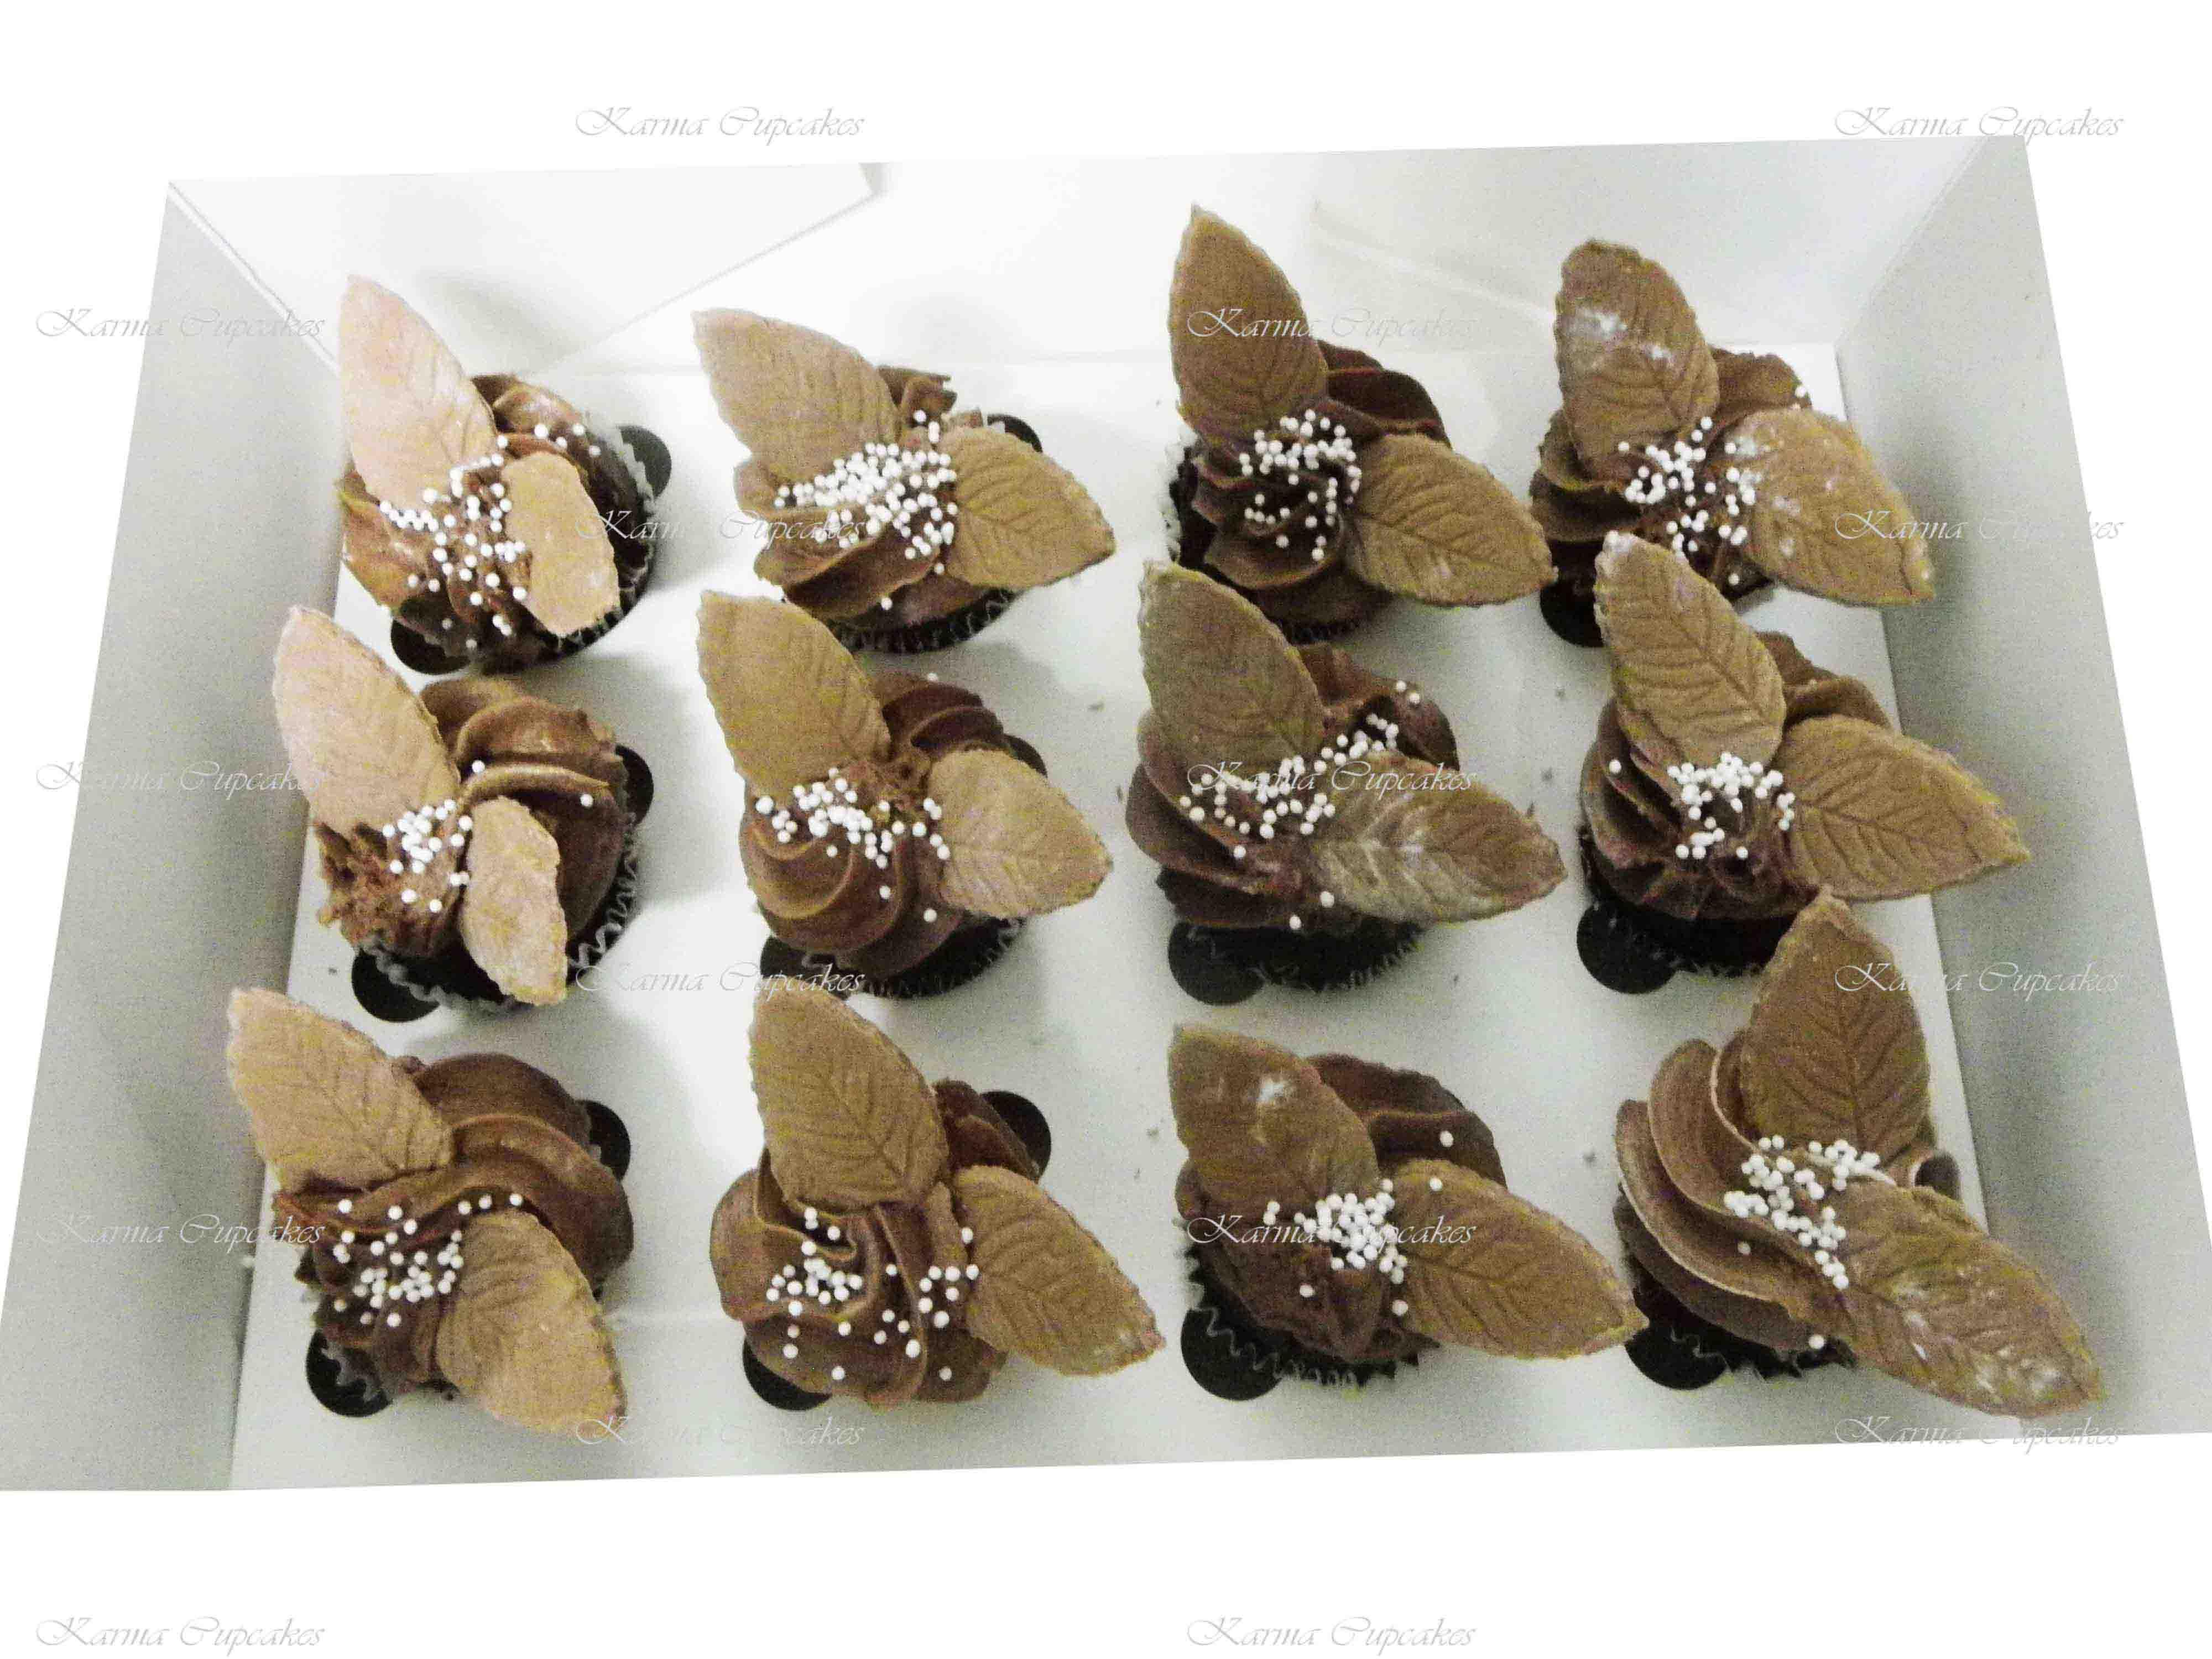 Vegan Chocolate High Tea Cupcakes with leaves